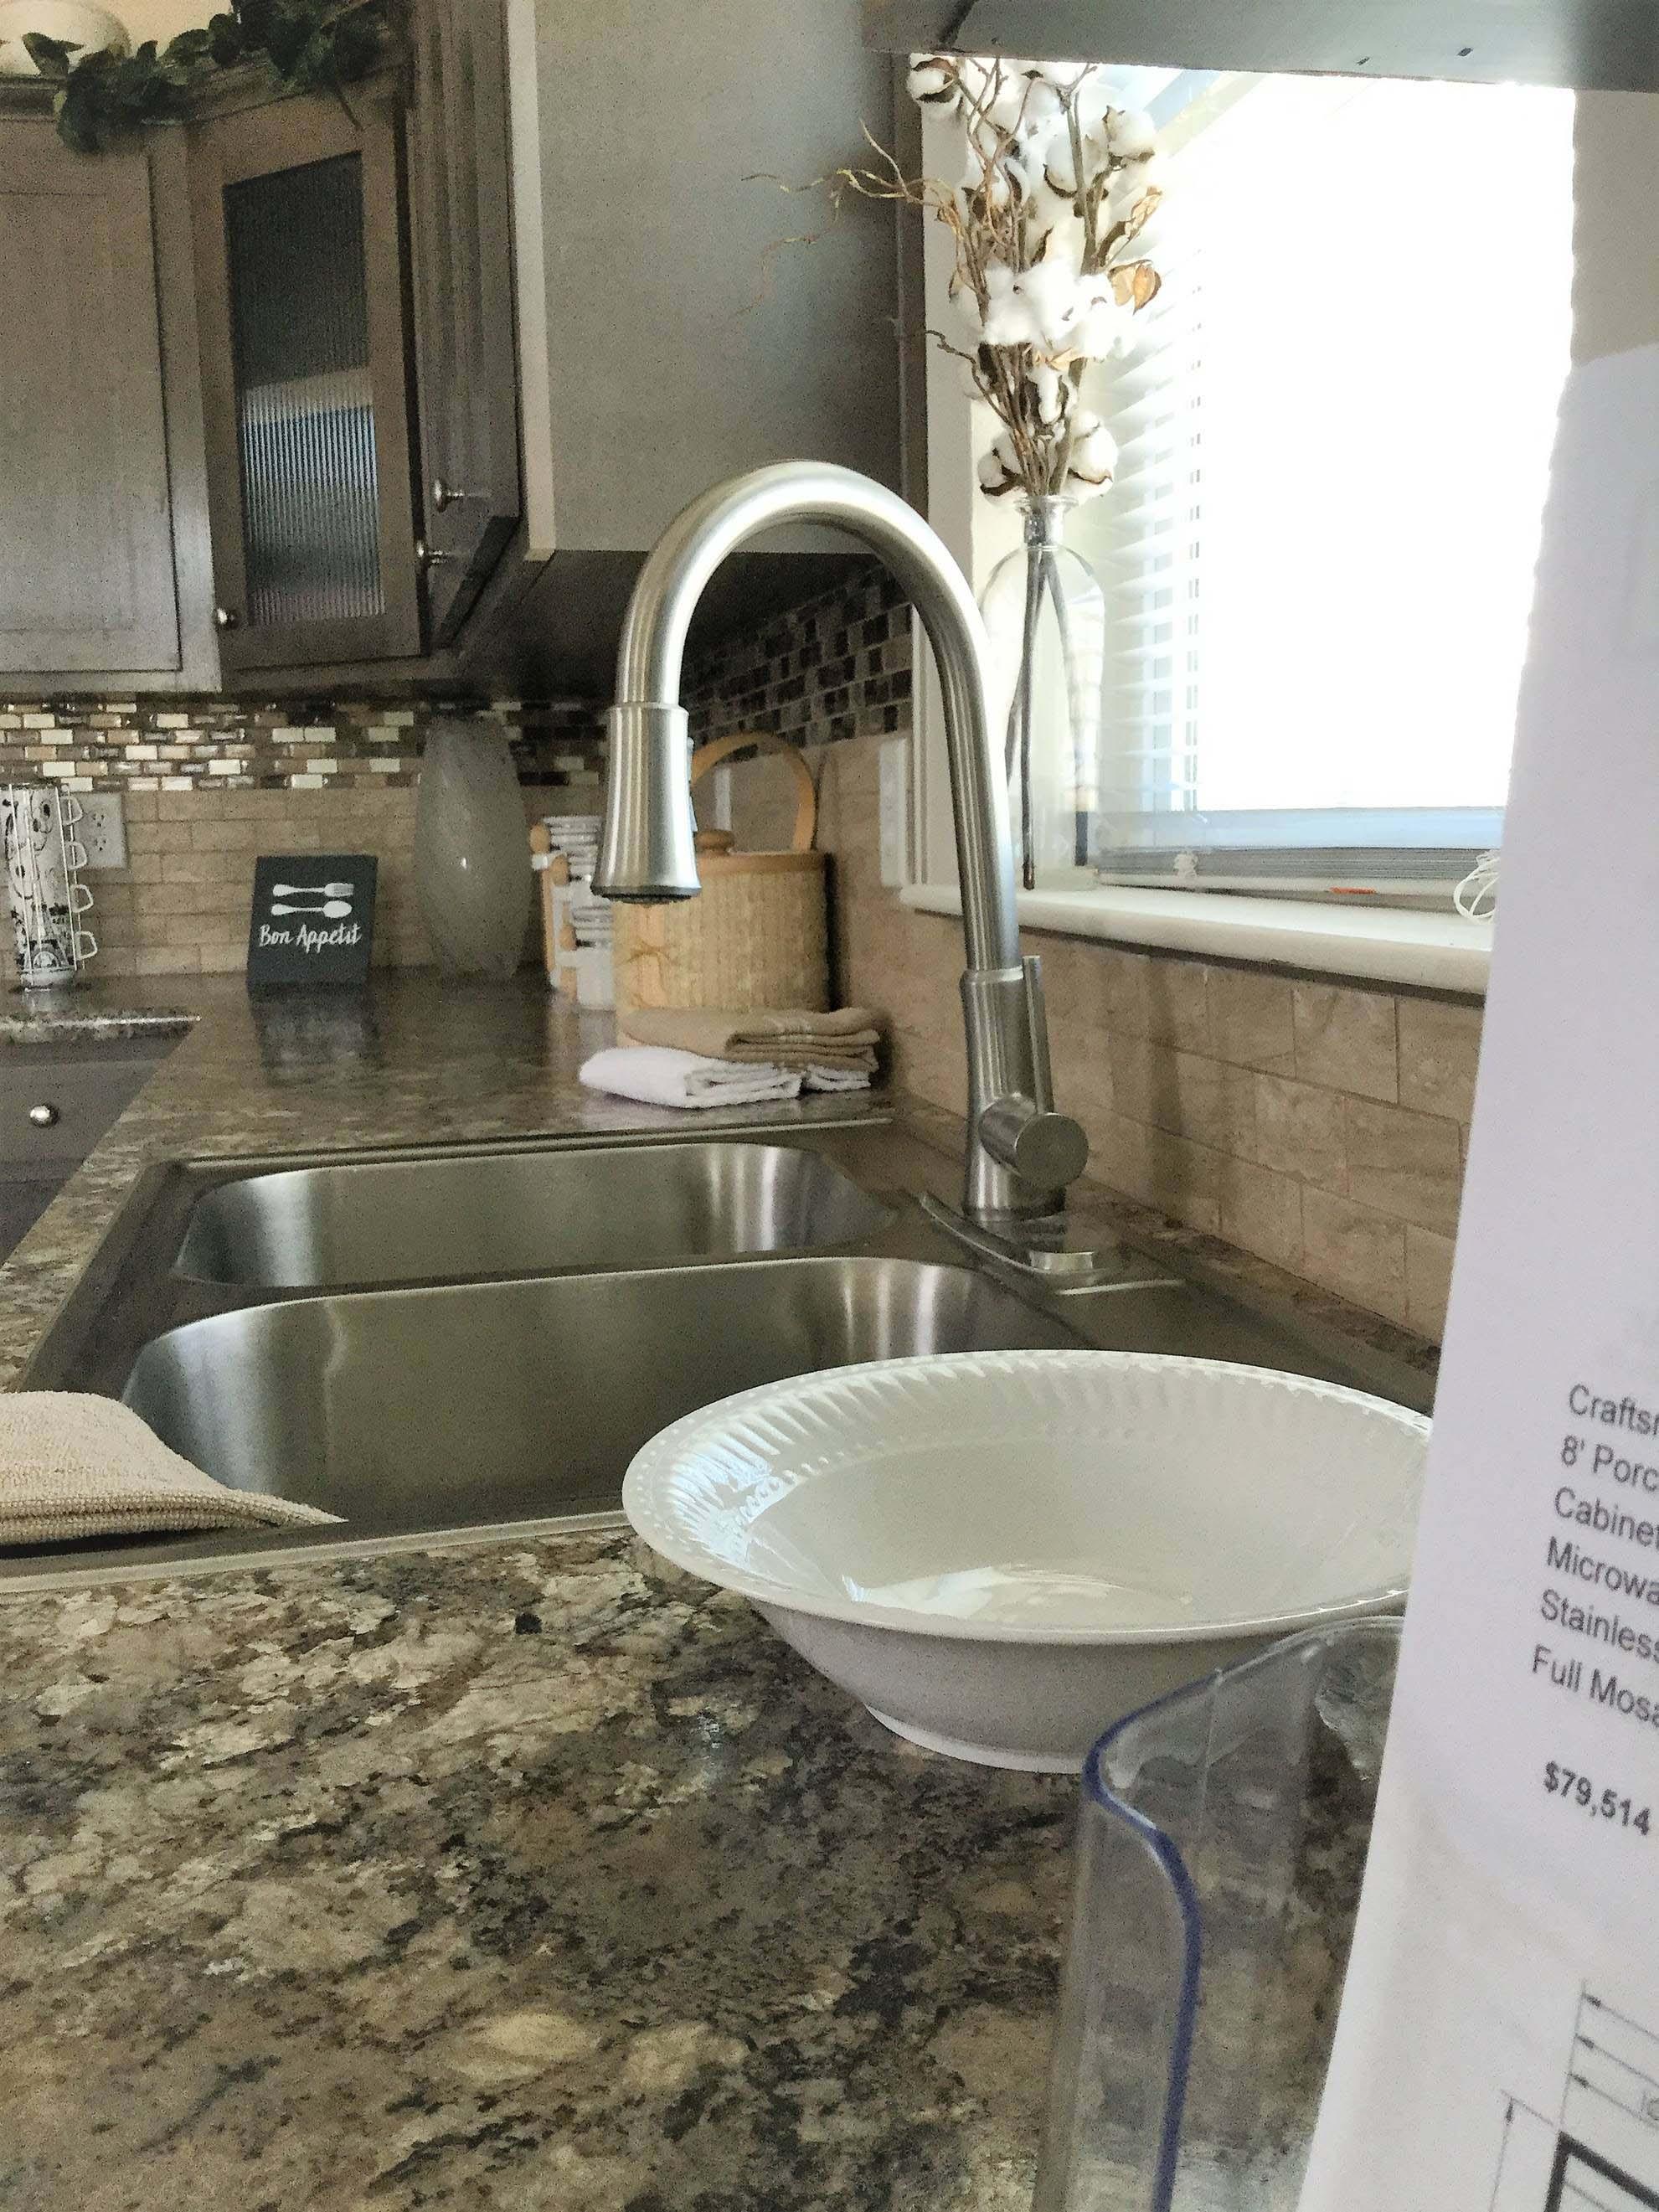 Cedar Canyon / 2078 LS - Kitchen